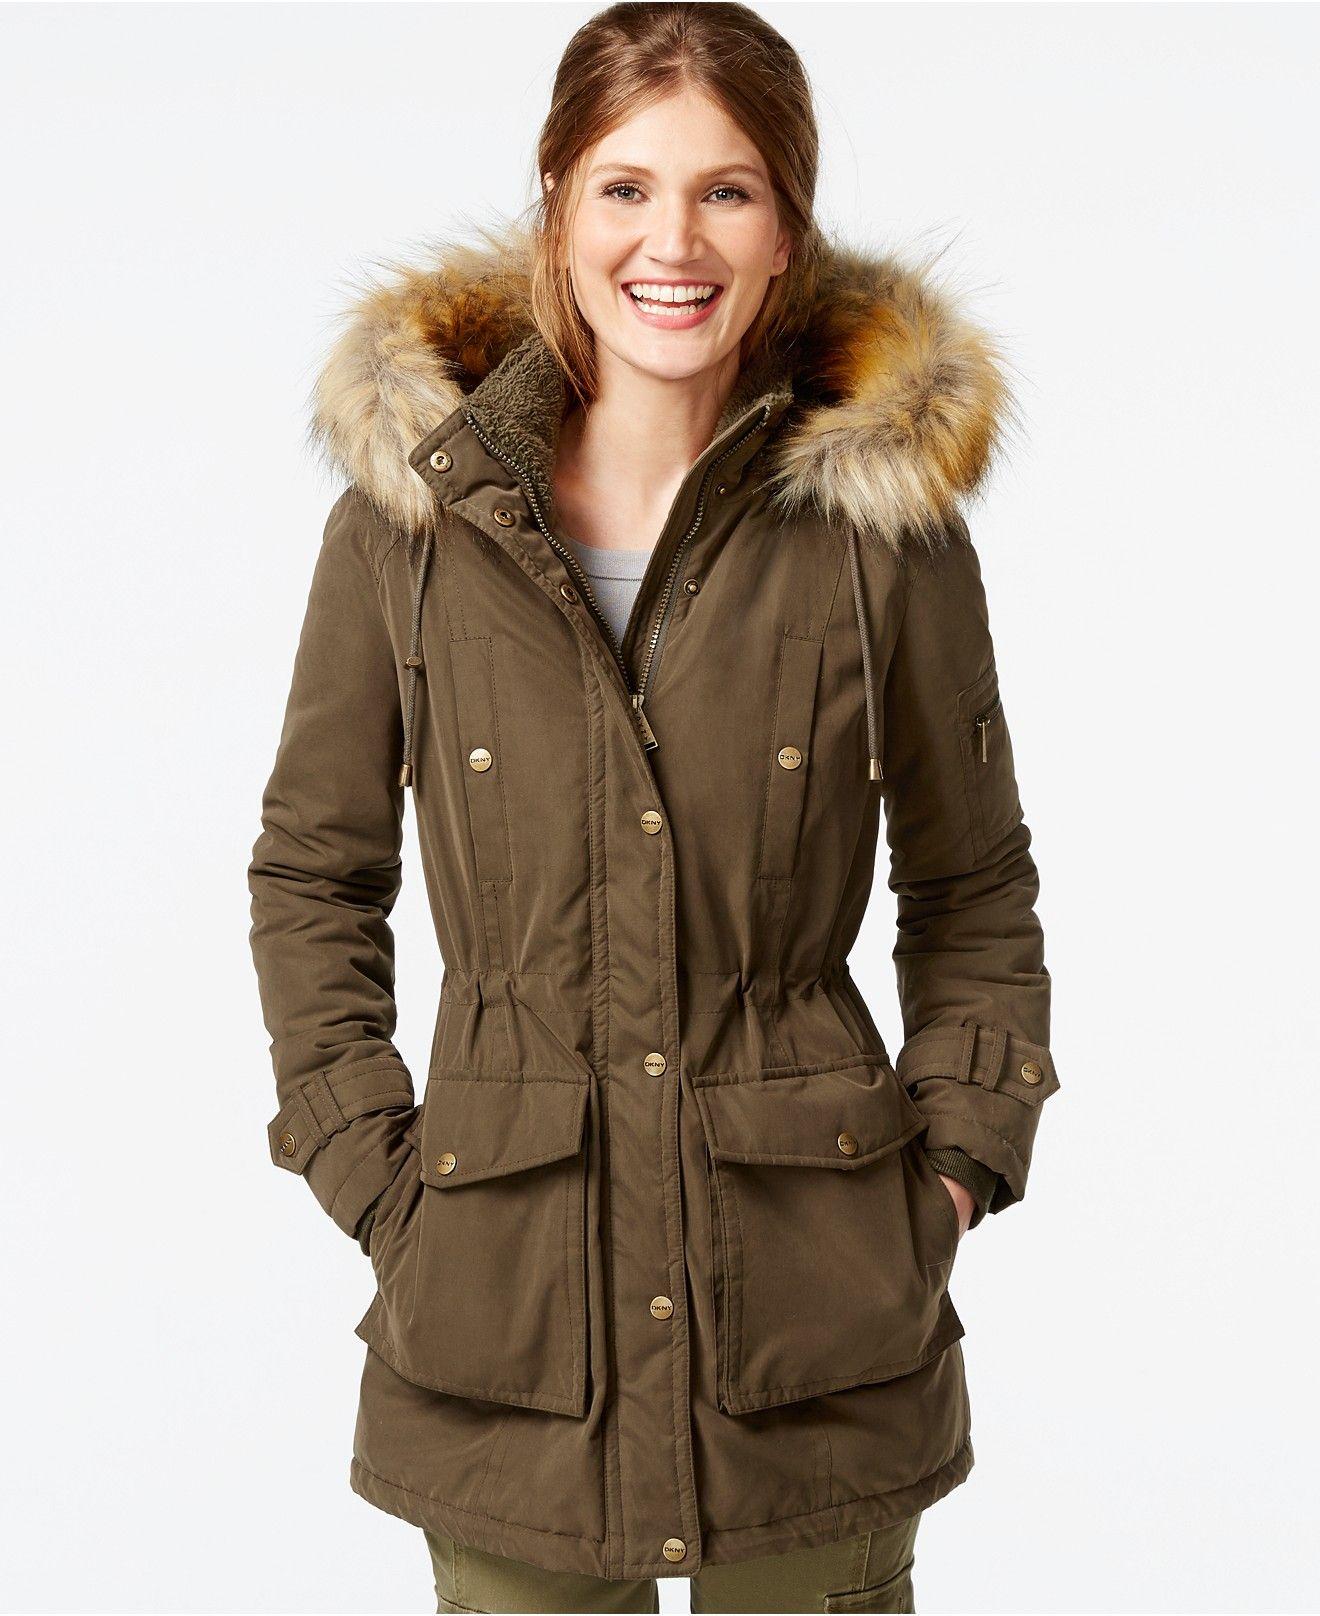 17e6e1ce78703 DKNY Faux-Fur-Trim Hooded Parka - Coats - Women - Macy s